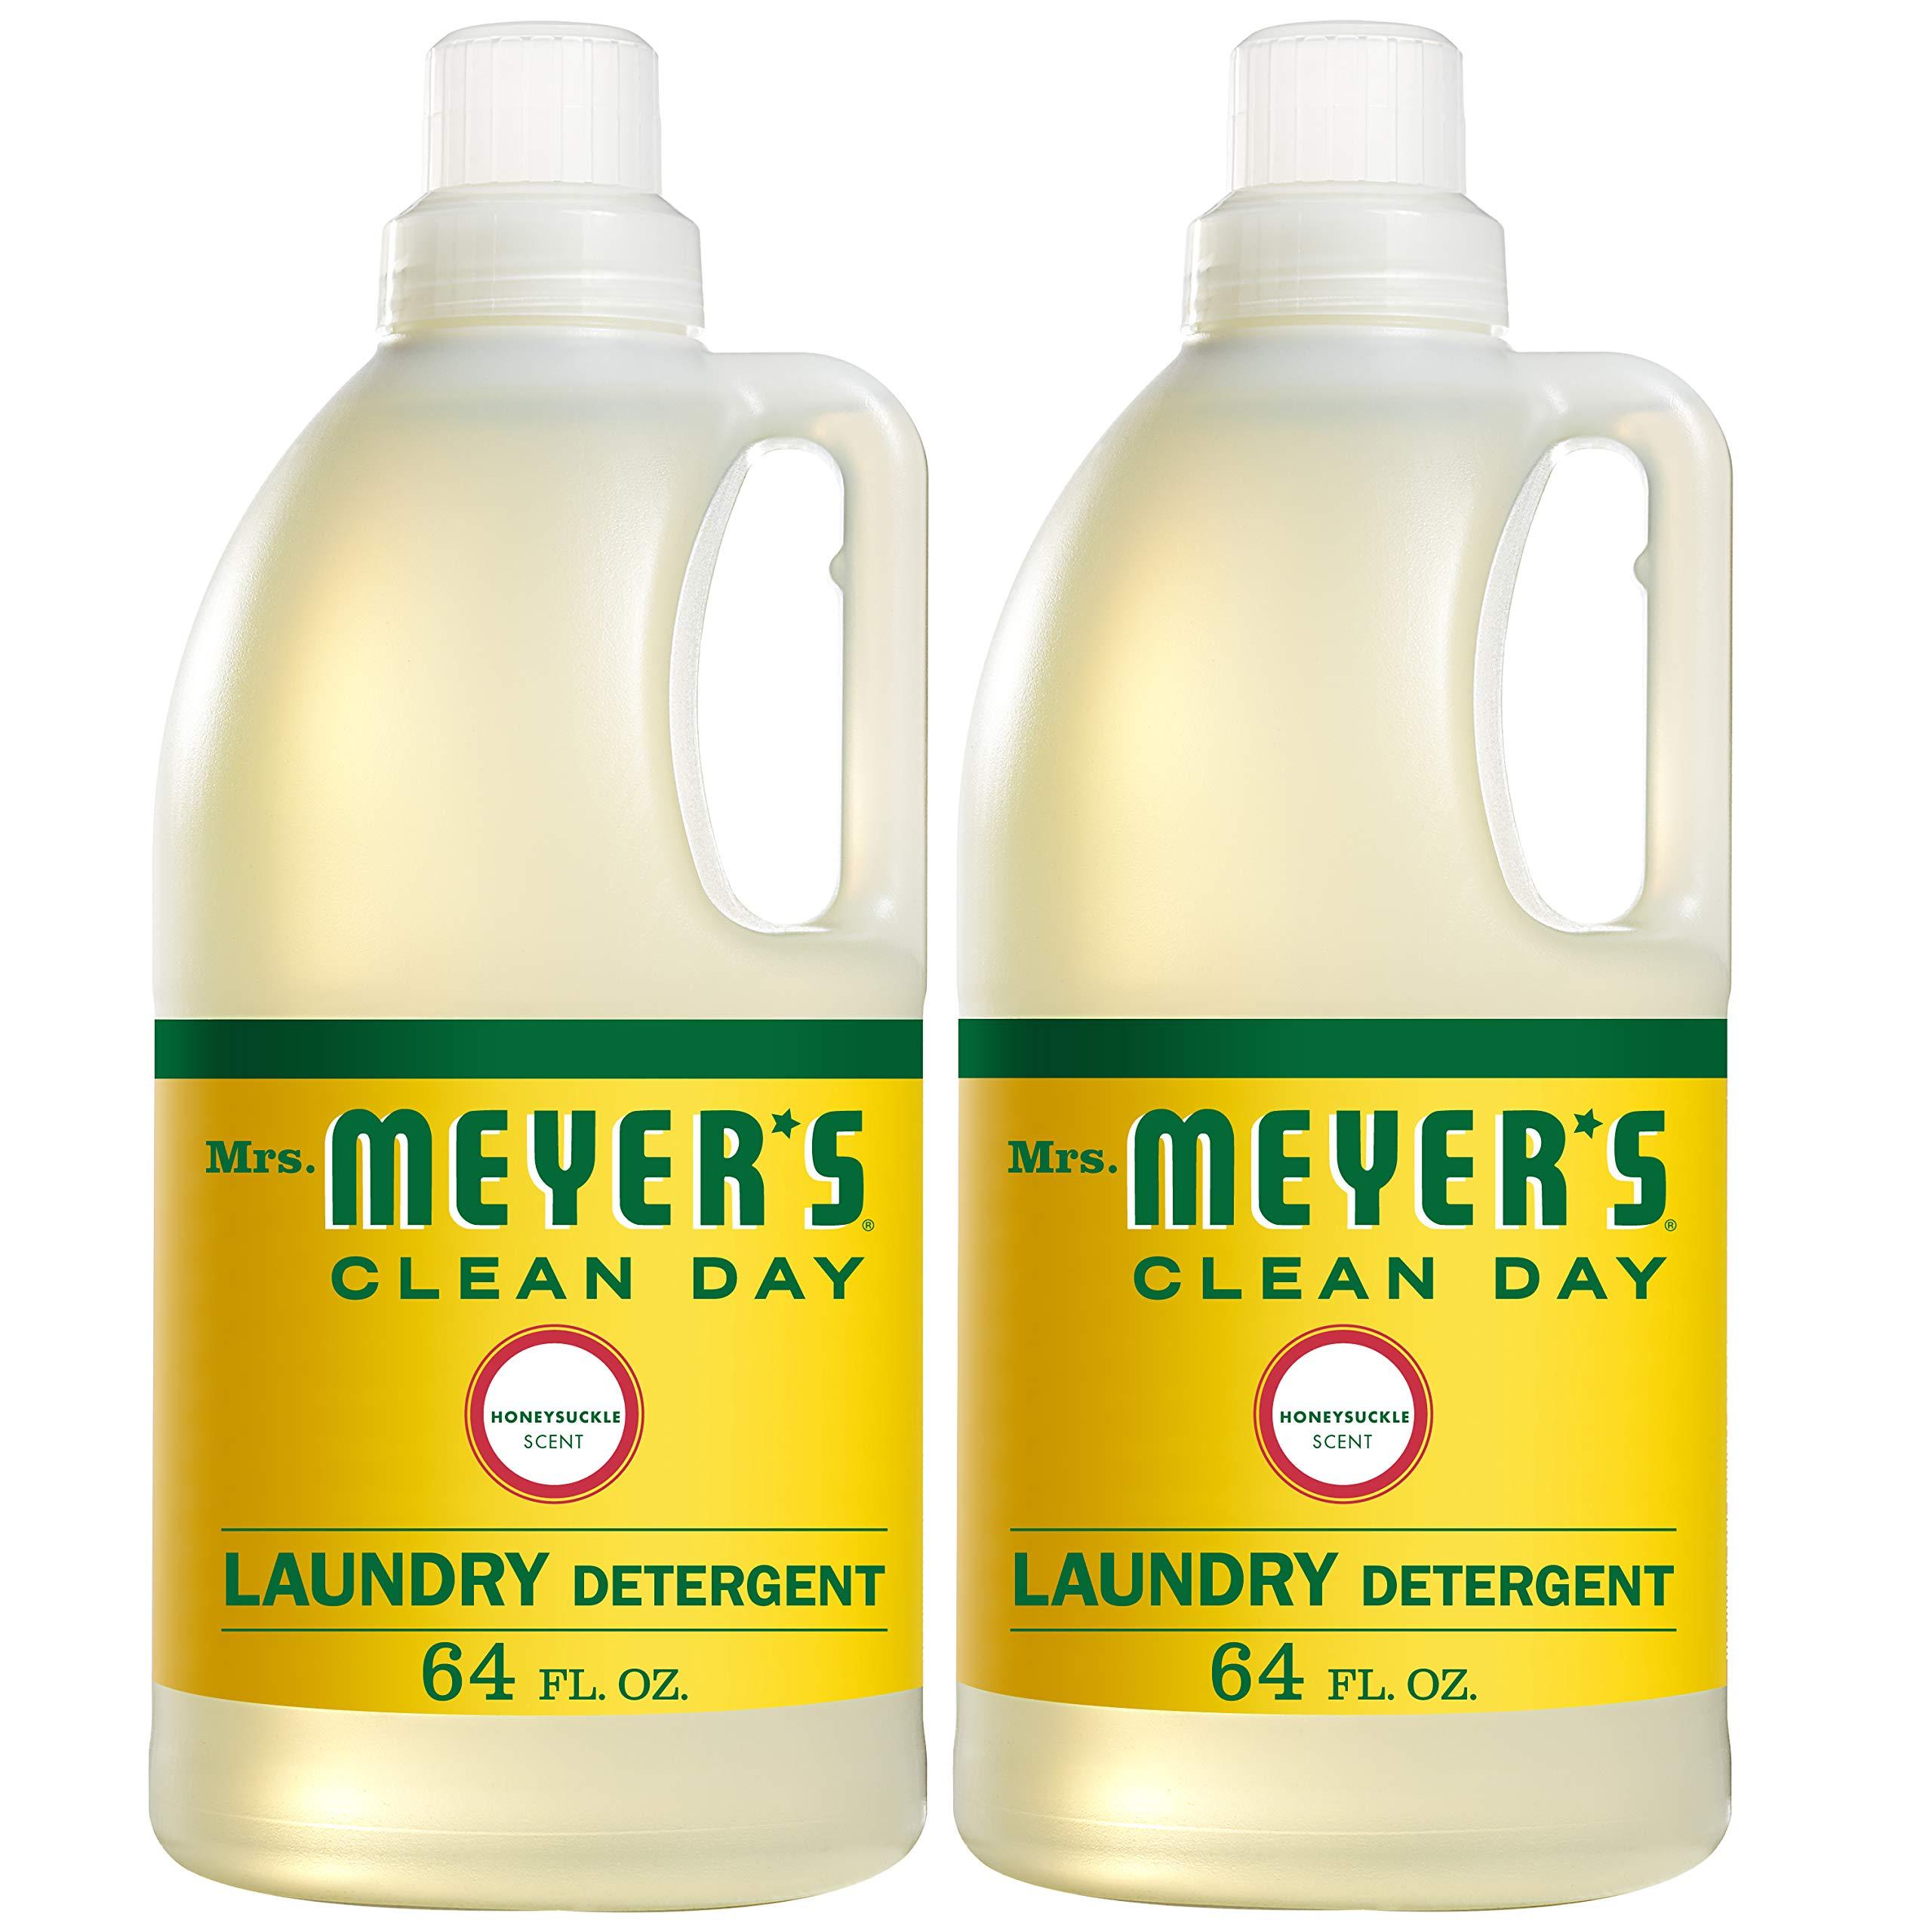 Mrs. Meyer's Laundry Detergent, Honeysuckle, 64 fl oz (2 ct) by Mrs. Meyer's Clean Day